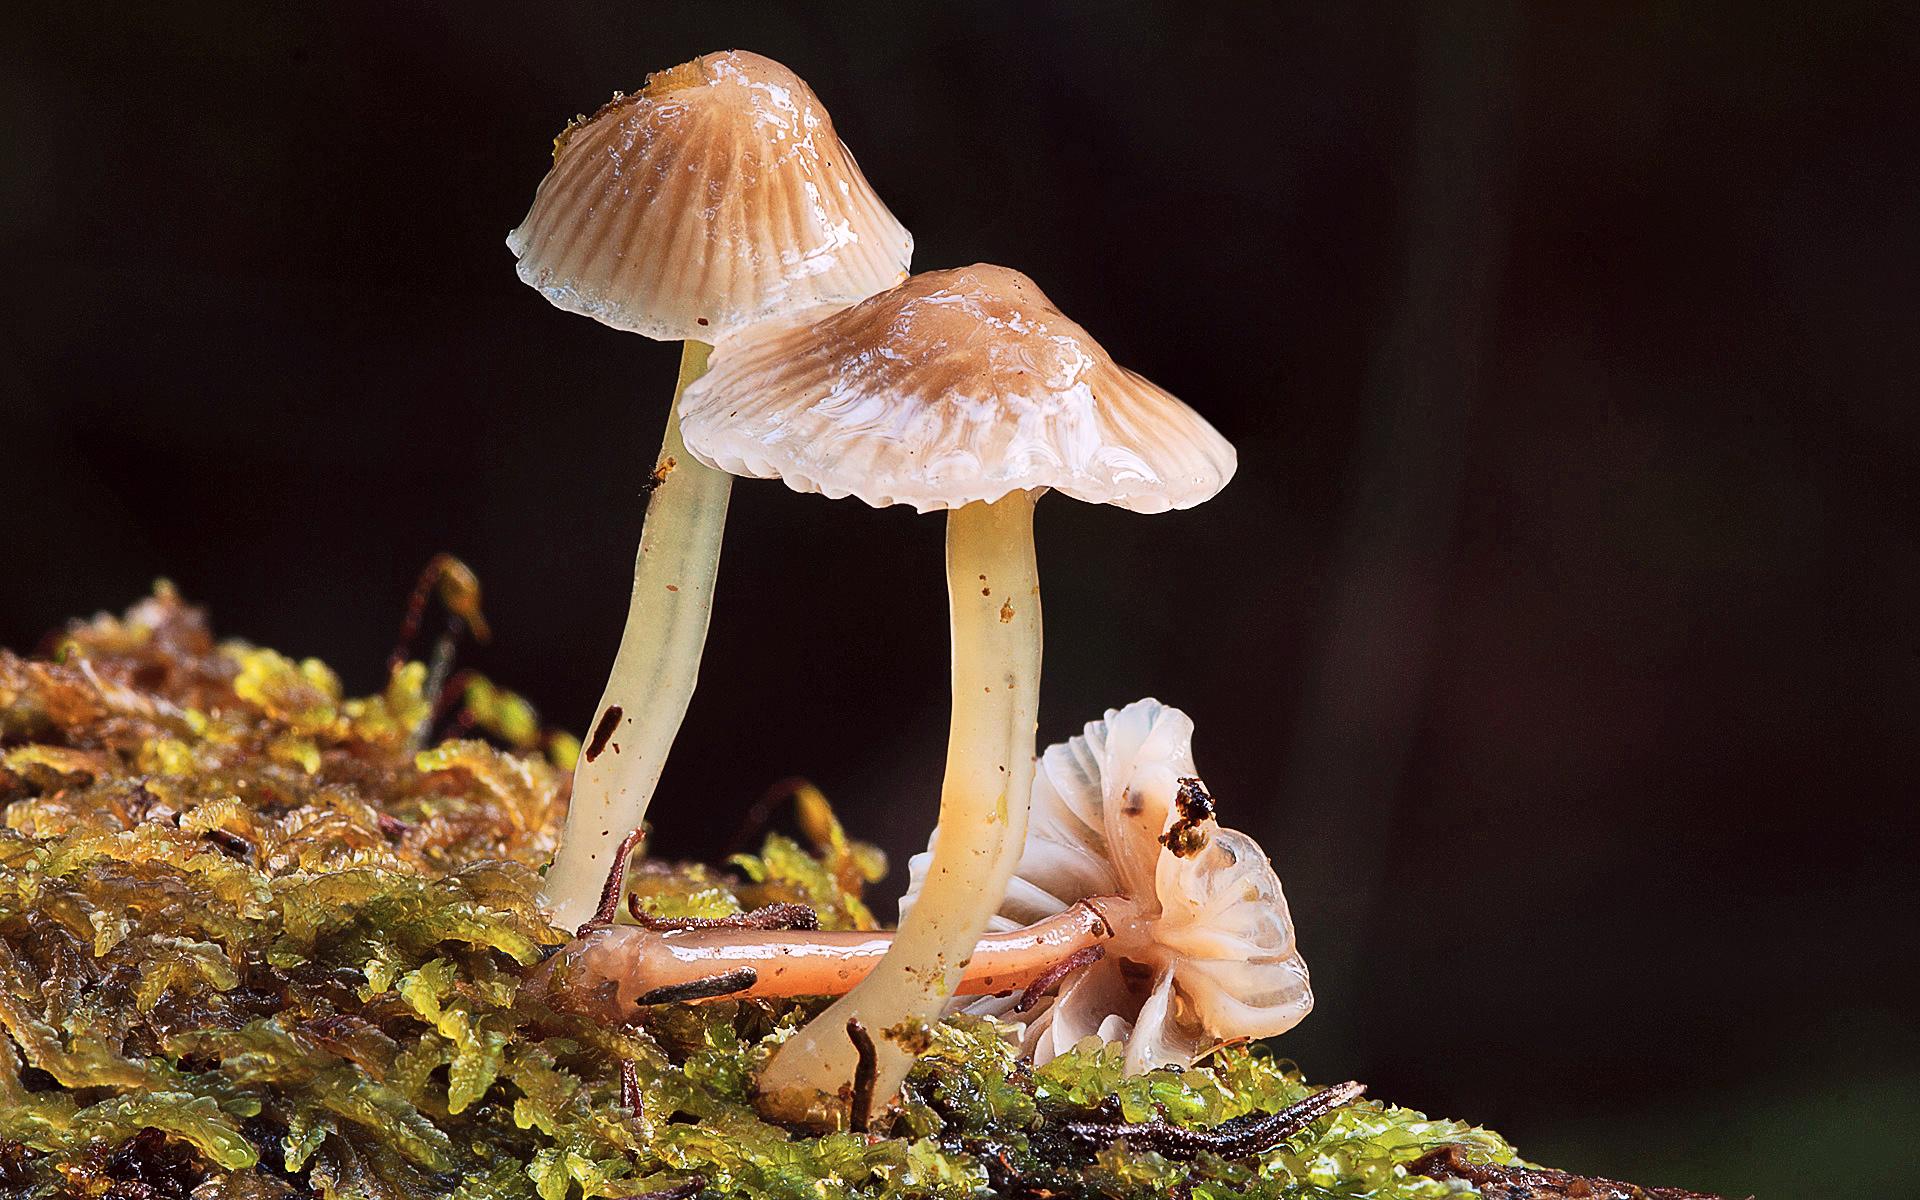 Tasmanian fungi photography by Heather Elson